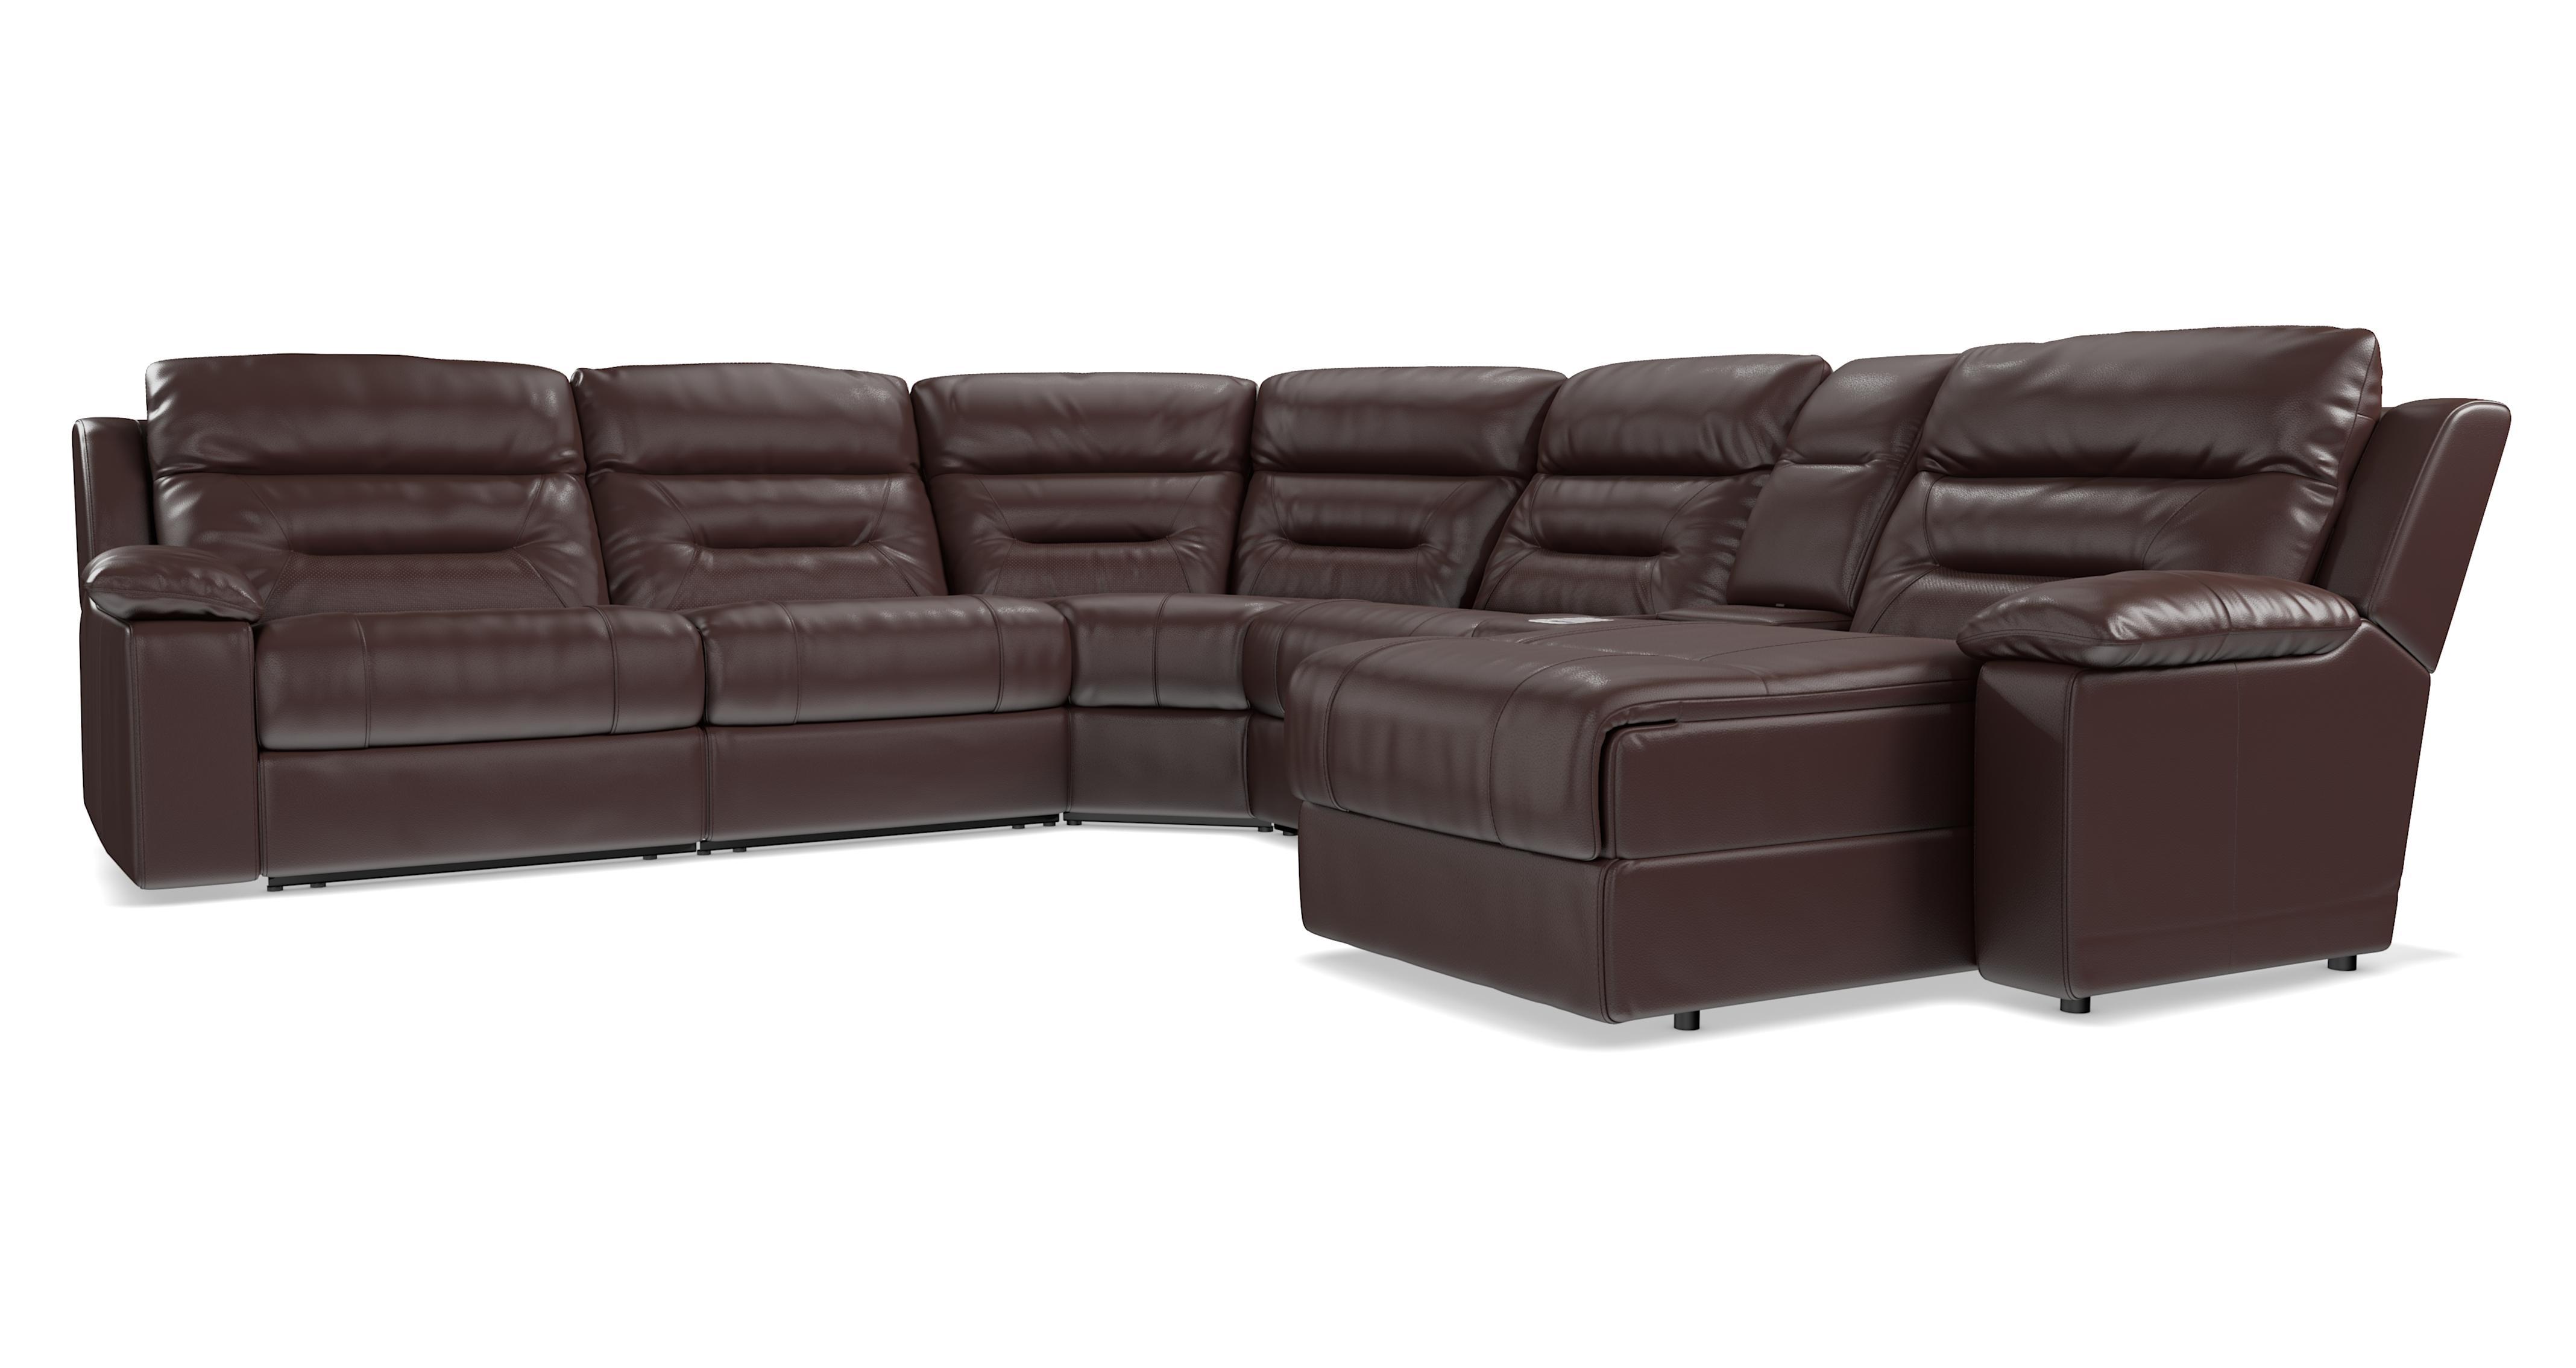 dfs navona sofa reviews set design pictures bachelor great living room furniture 2017 2018